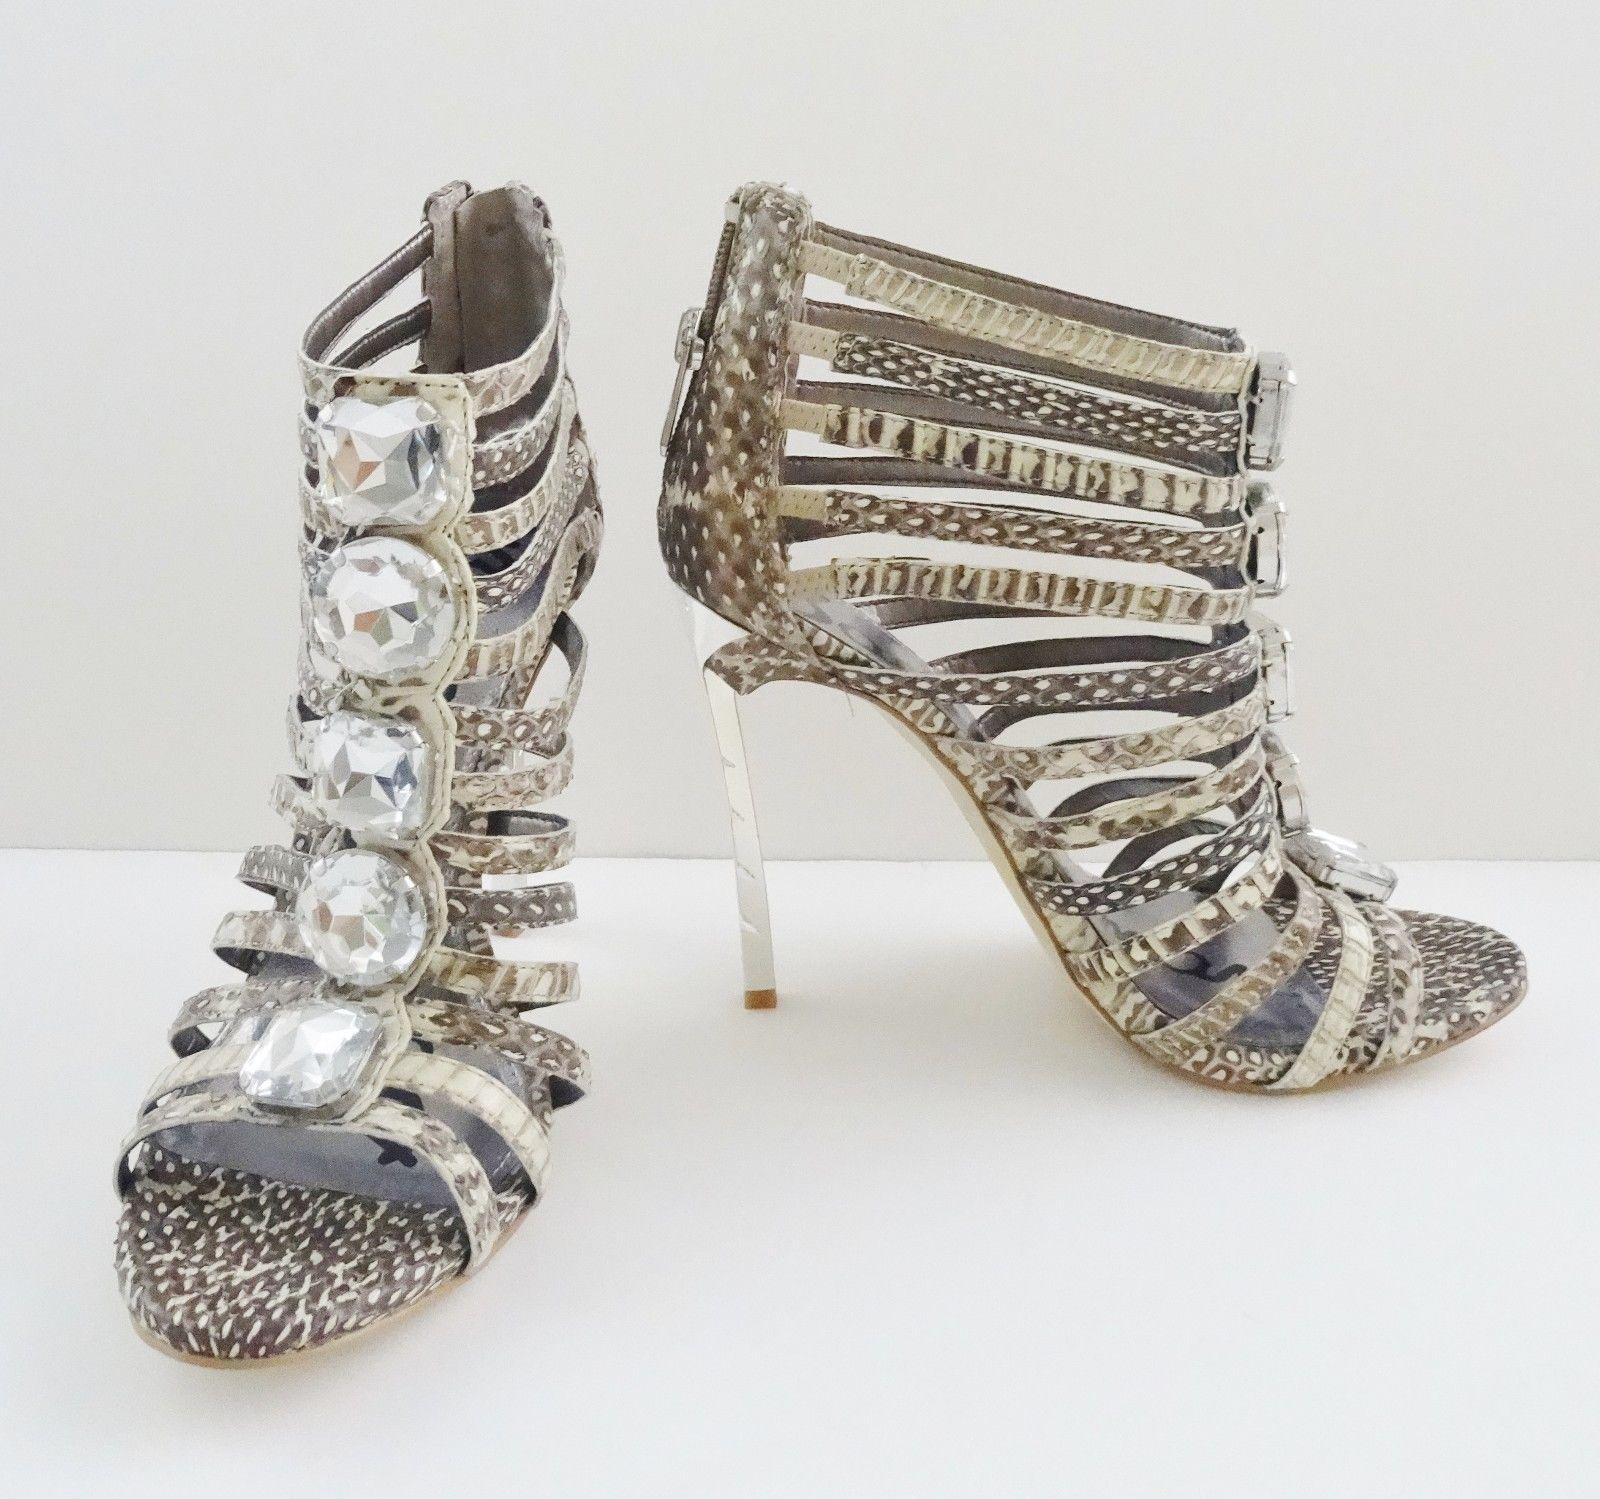 c060a63ae70d6 NIB Sam Edelman Hampton Ankle Caged Sandal Shoes Sz 7.5 M Sepia Snakeskin   170